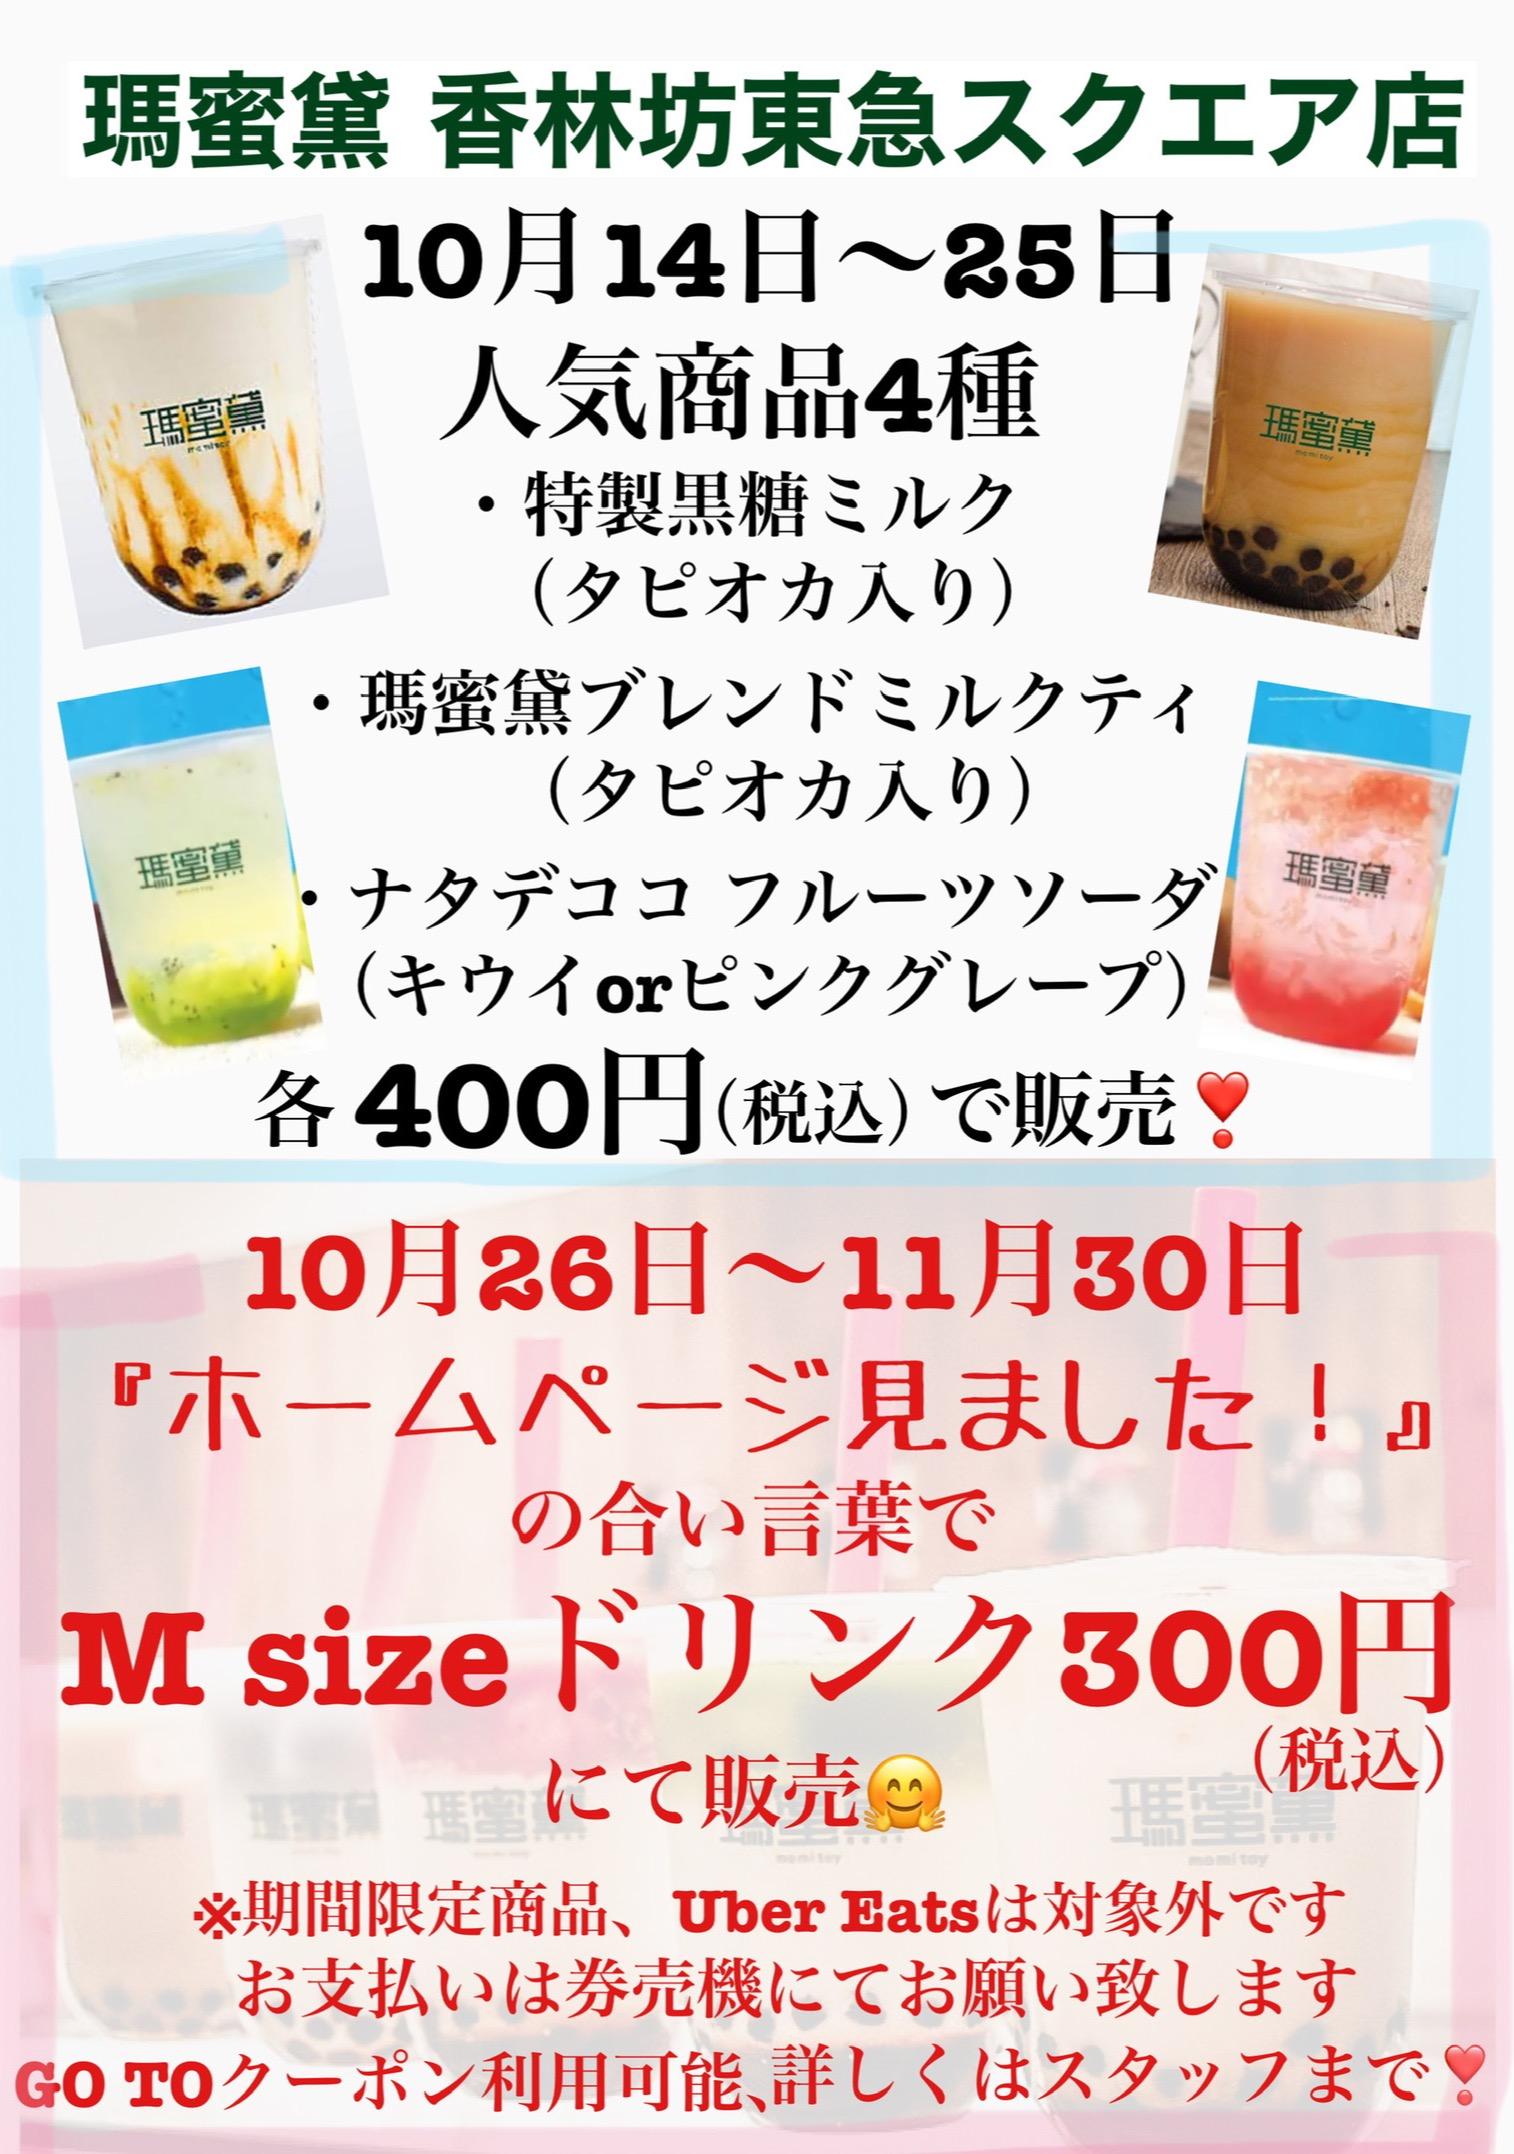 000278/3777fafa.png